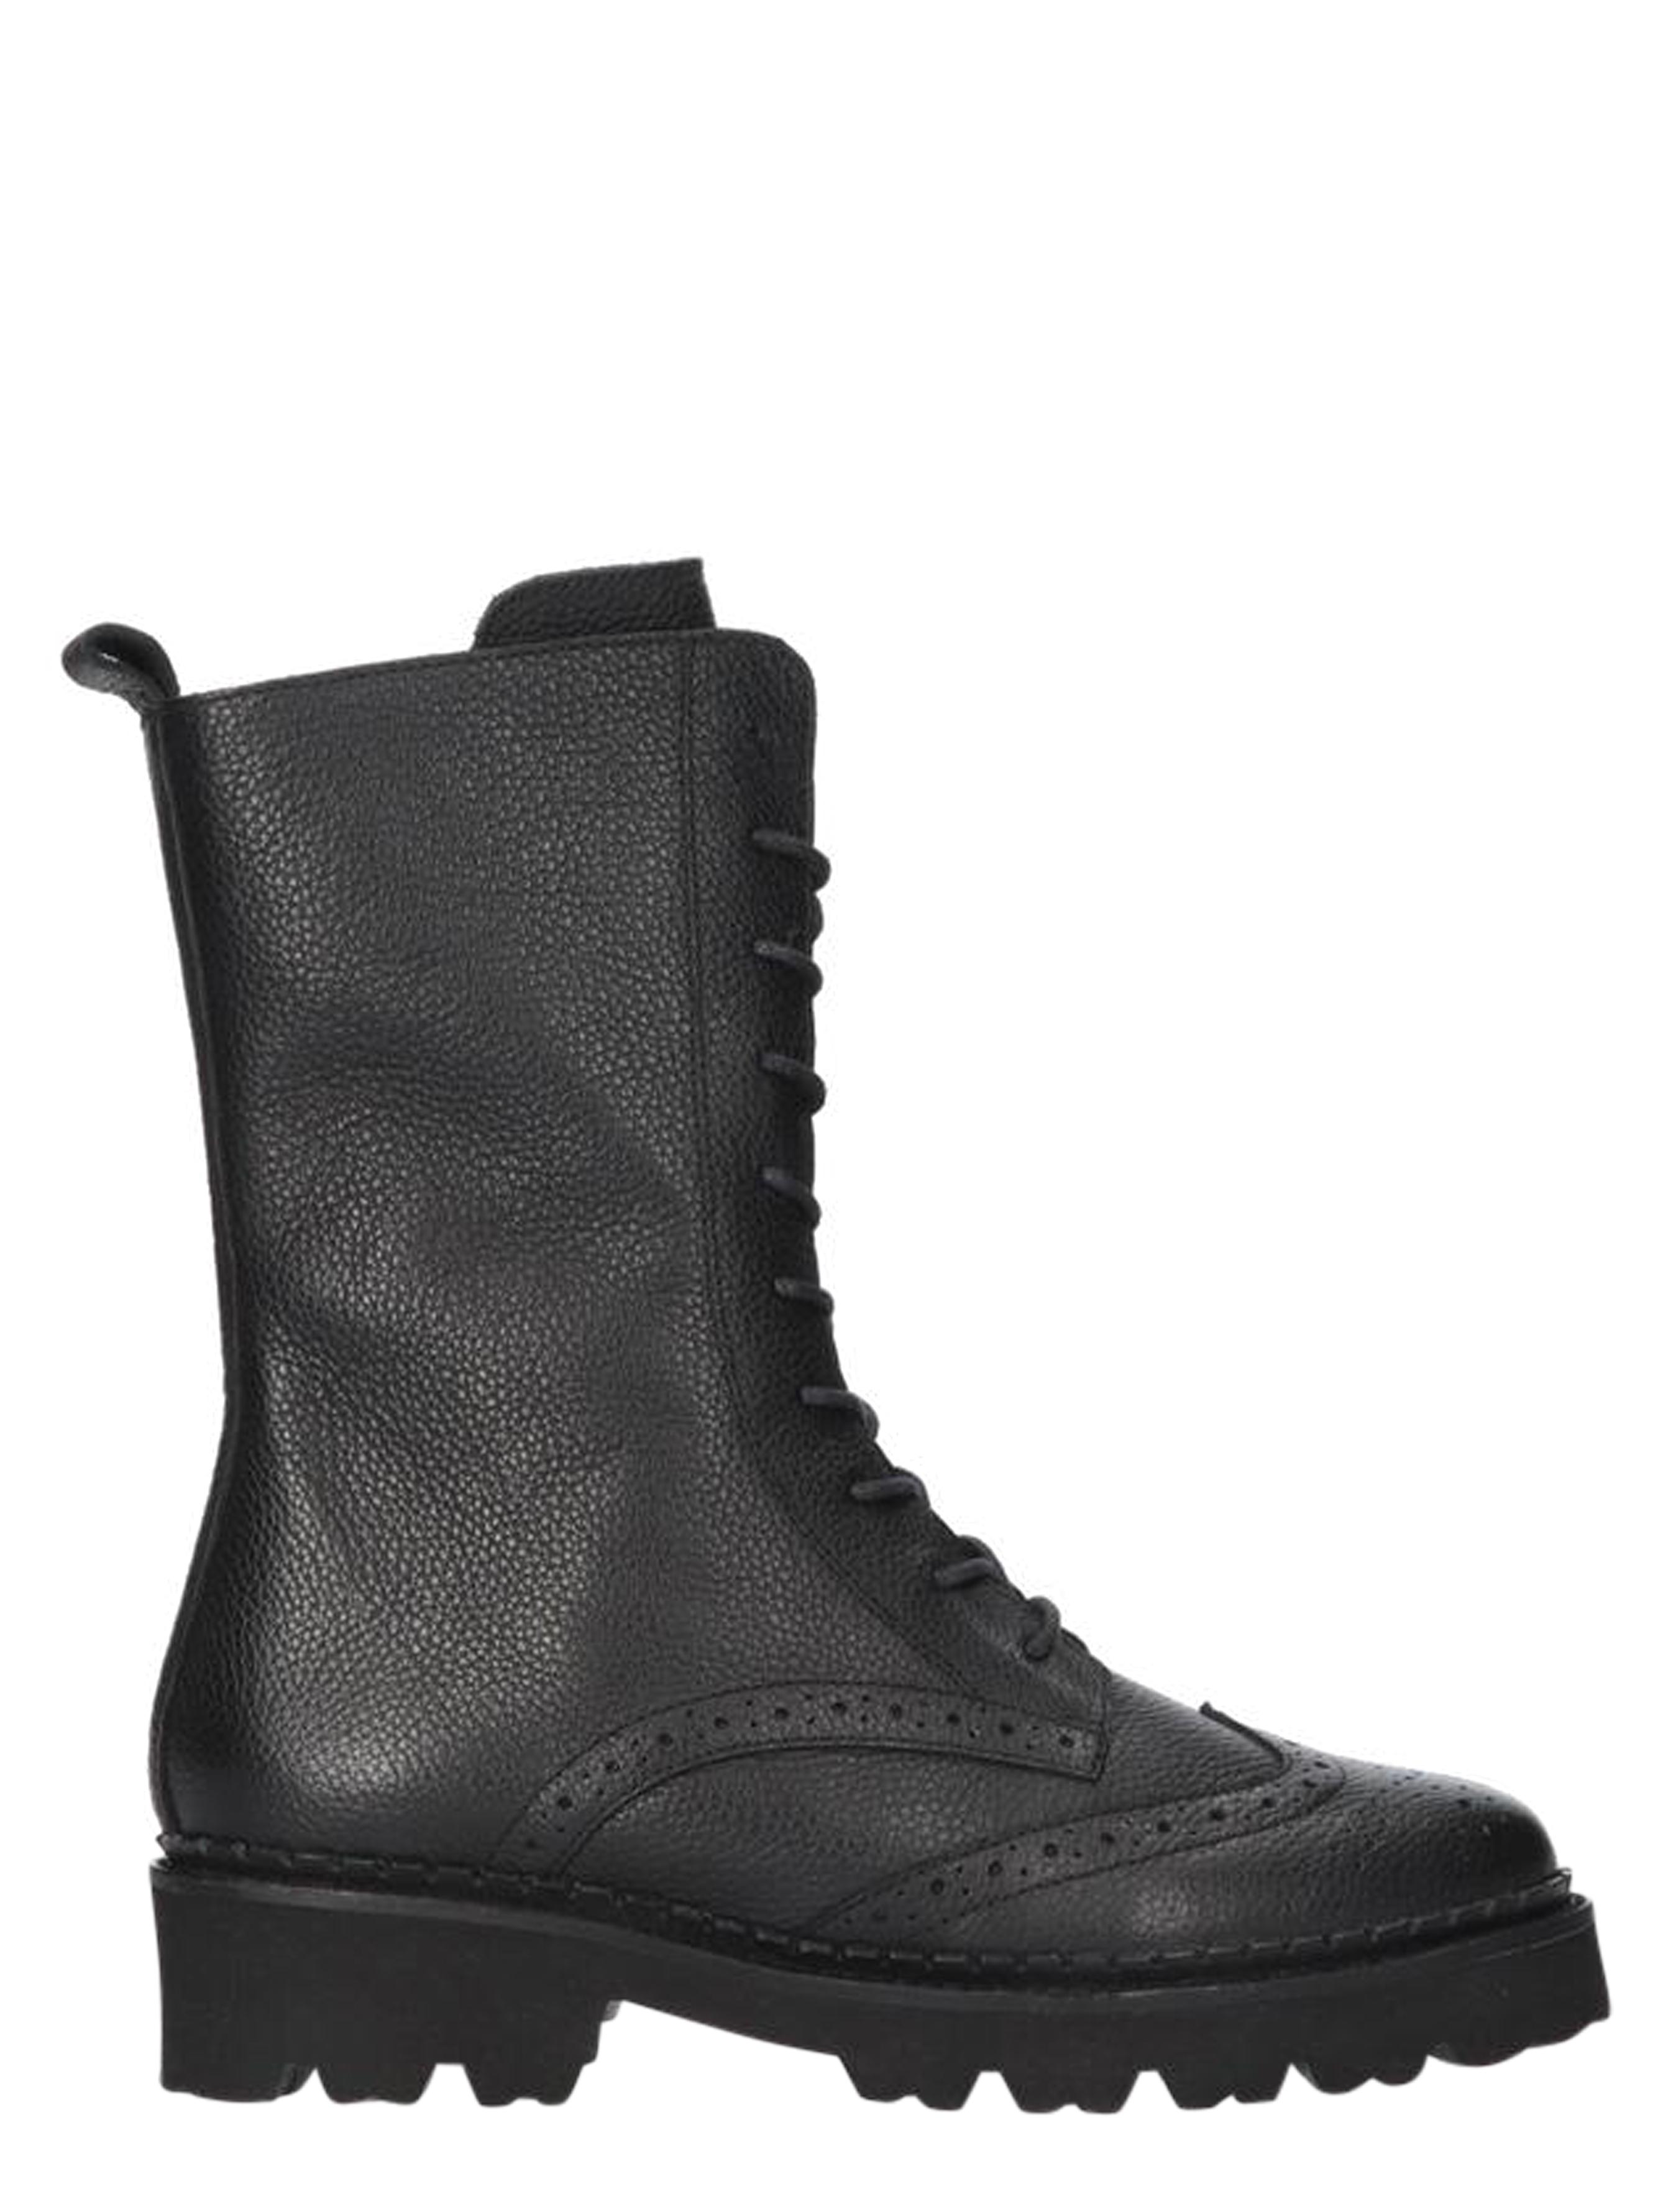 Tango Bee Bold 502-a Black Biker boots